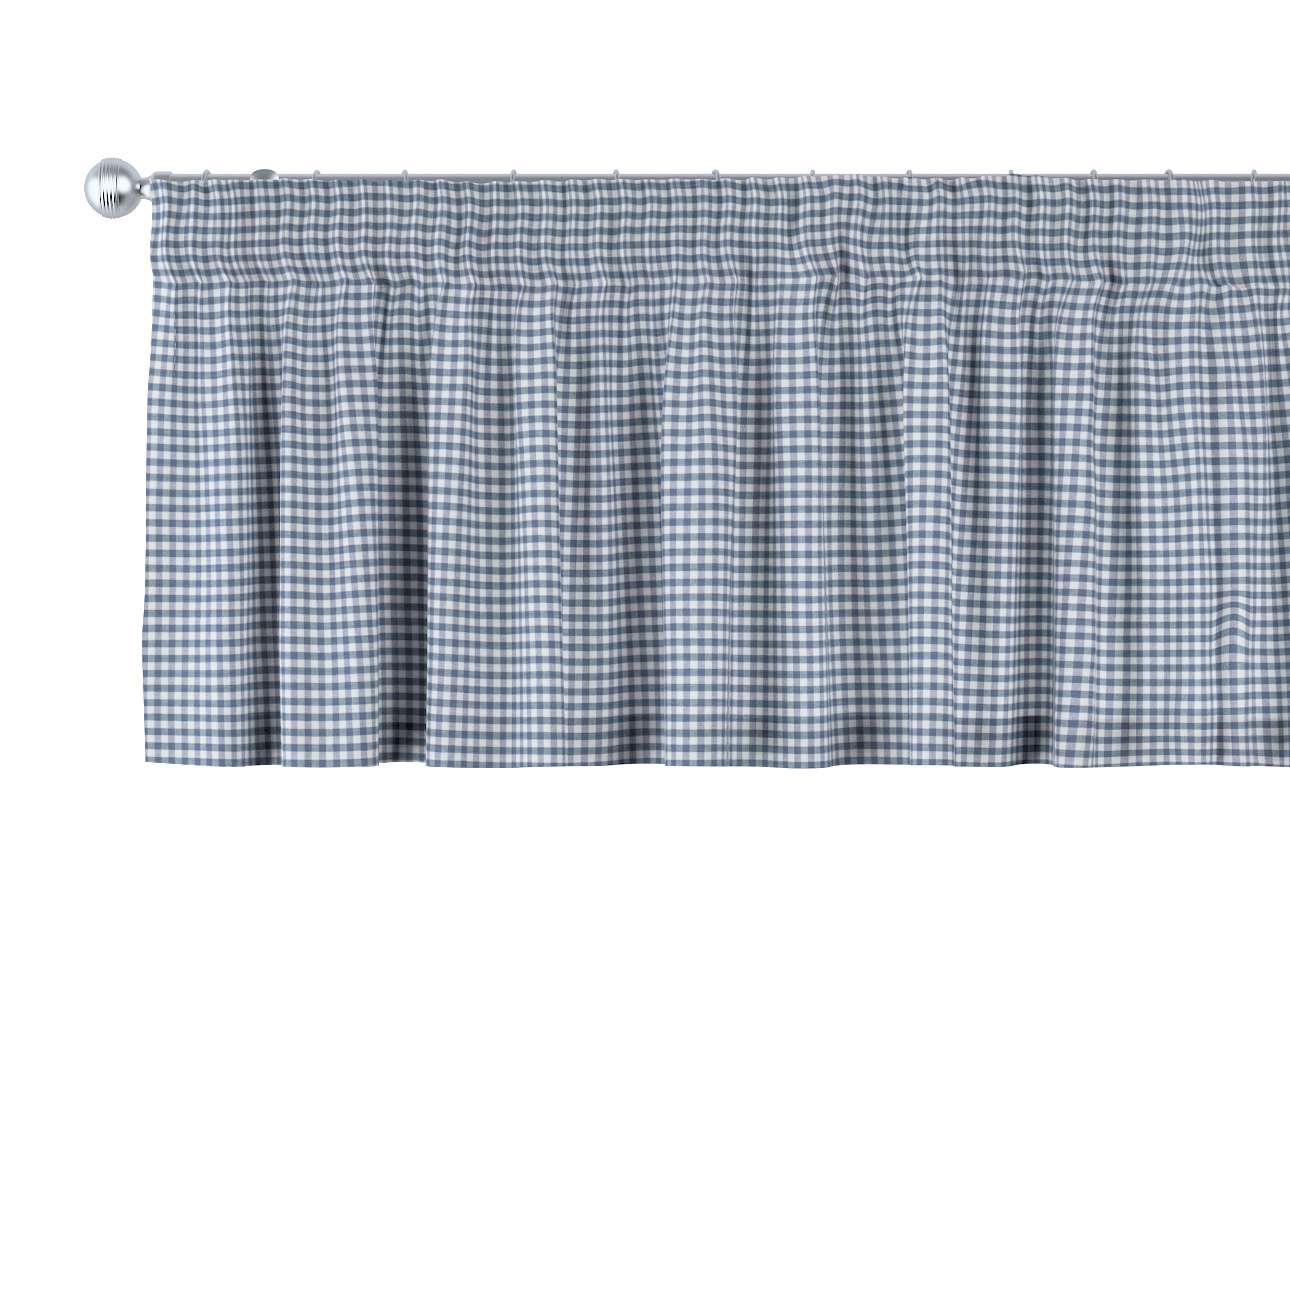 Kurzgardine mit Kräuselband 130 x 40 cm von der Kollektion Quadro, Stoff: 136-00